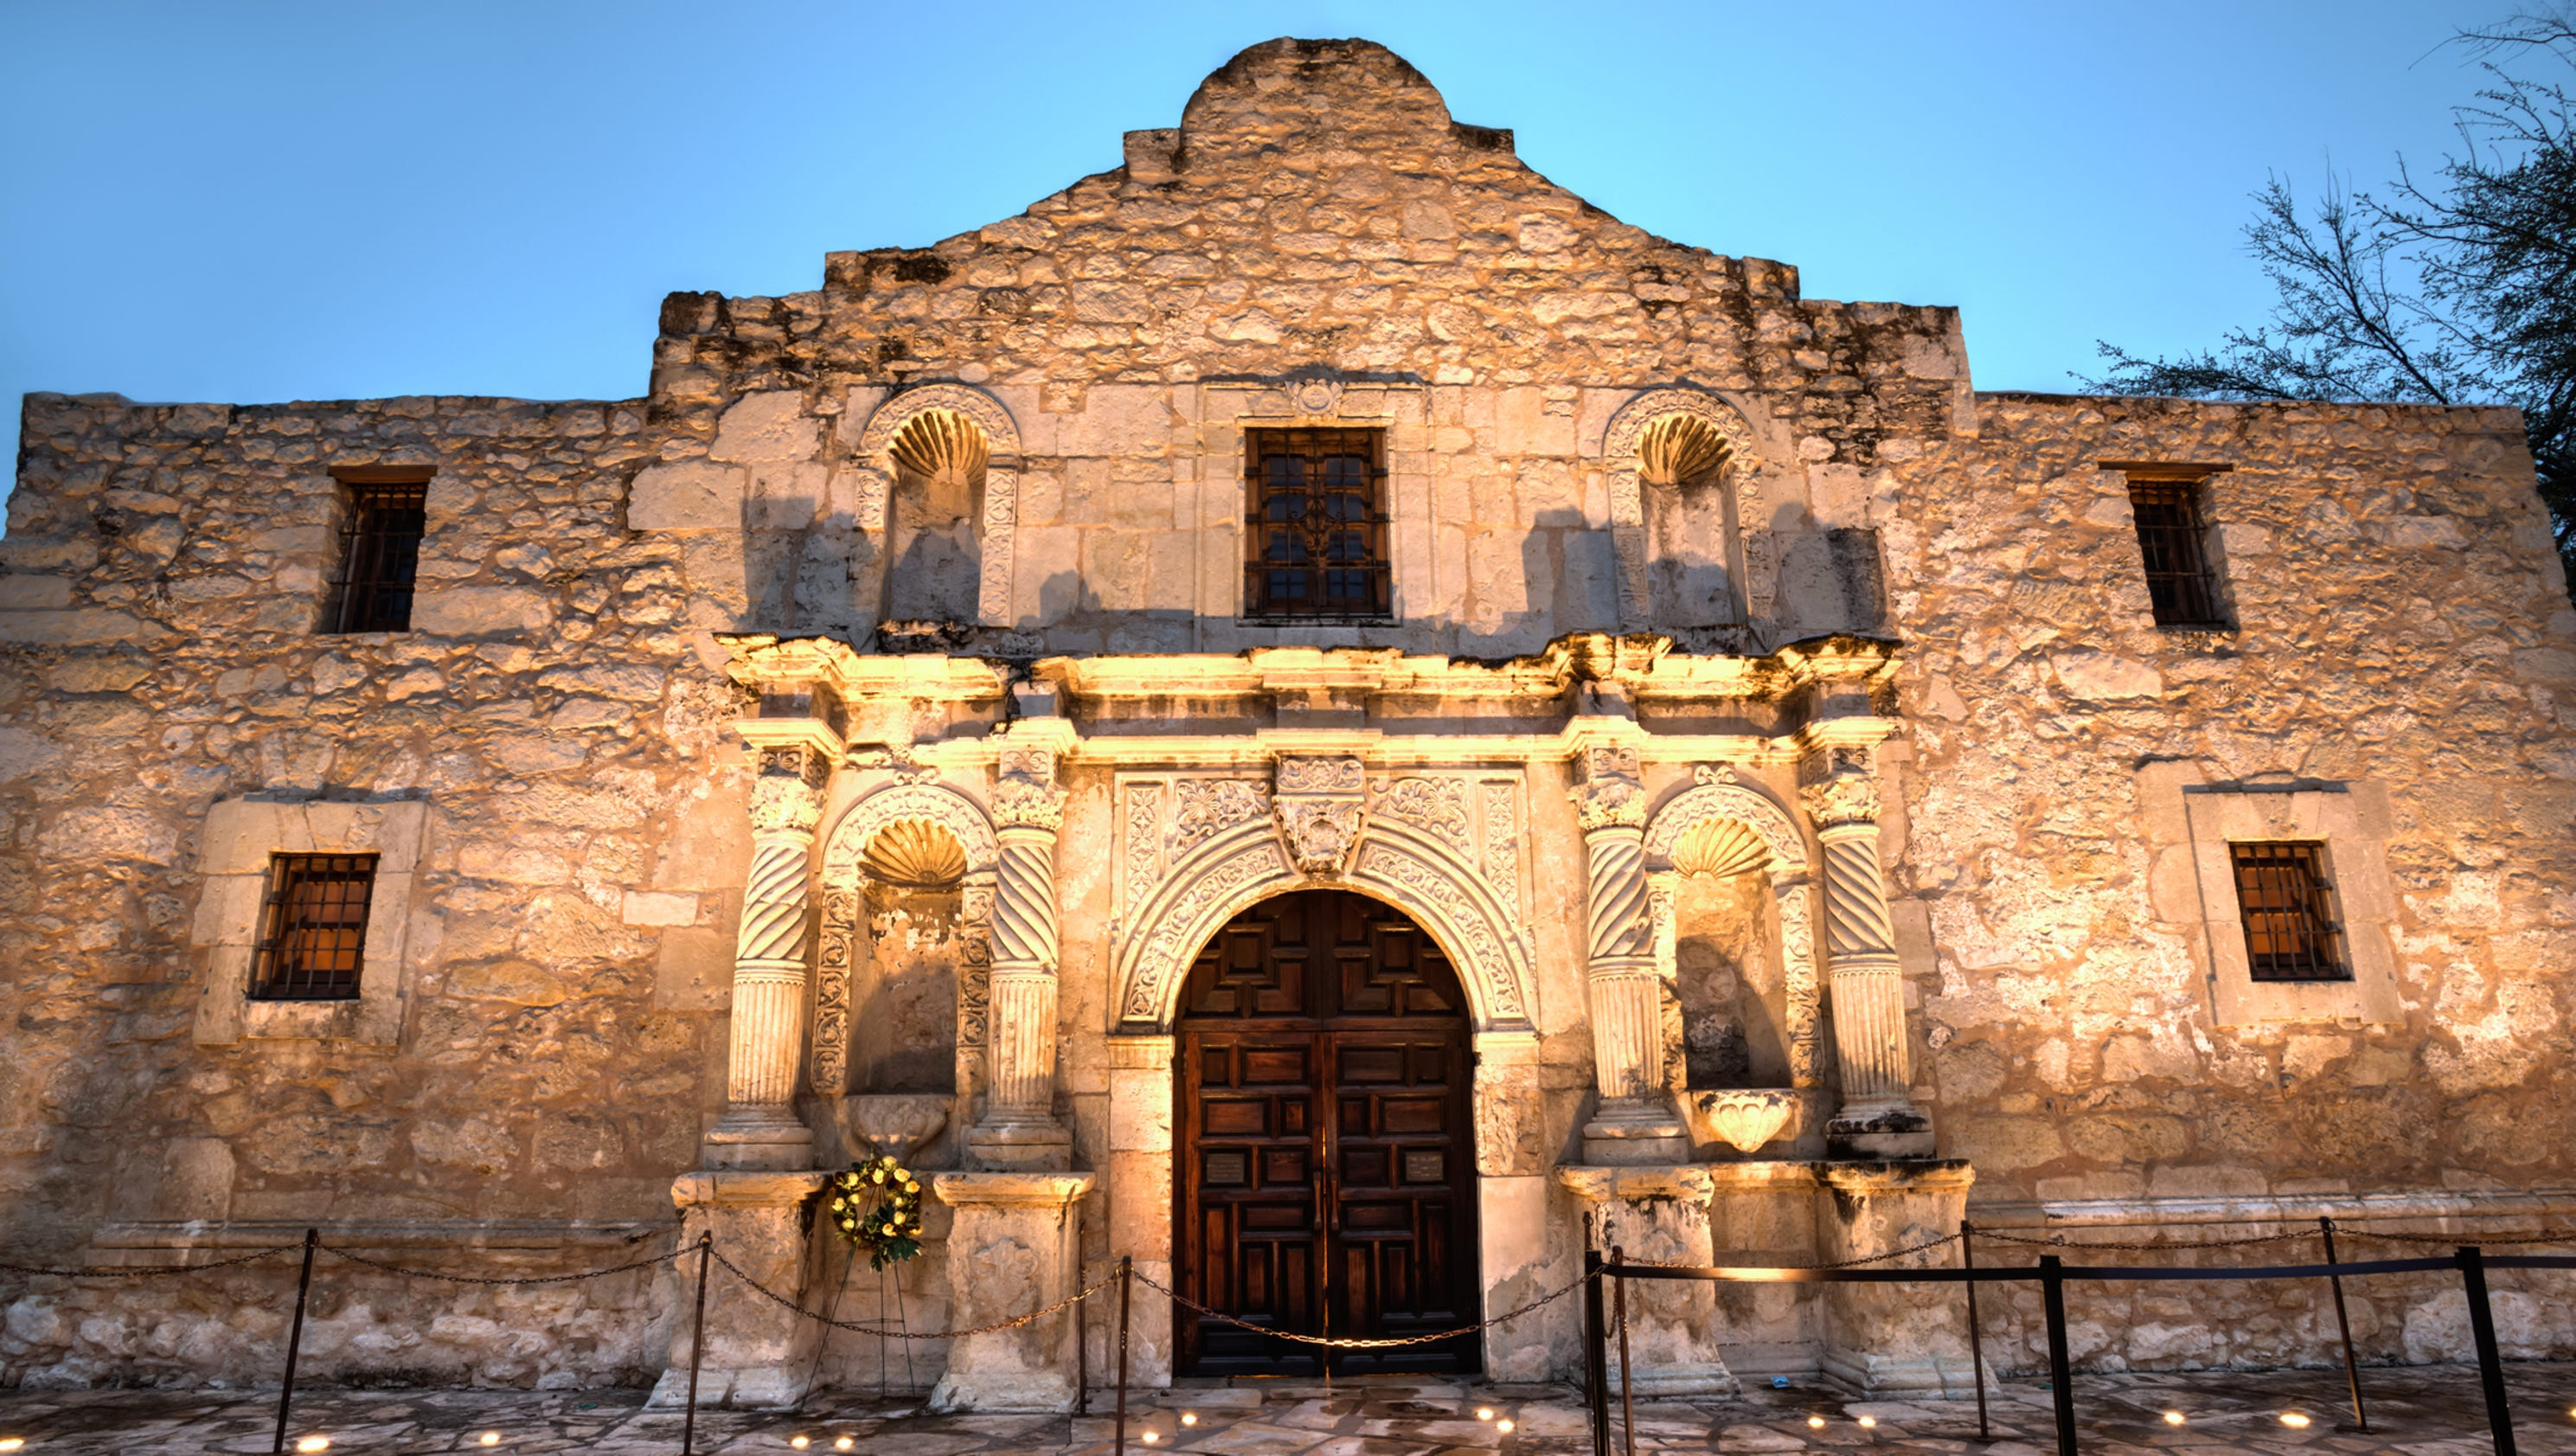 San Antonio Regional Hospital Careers - Apply Today